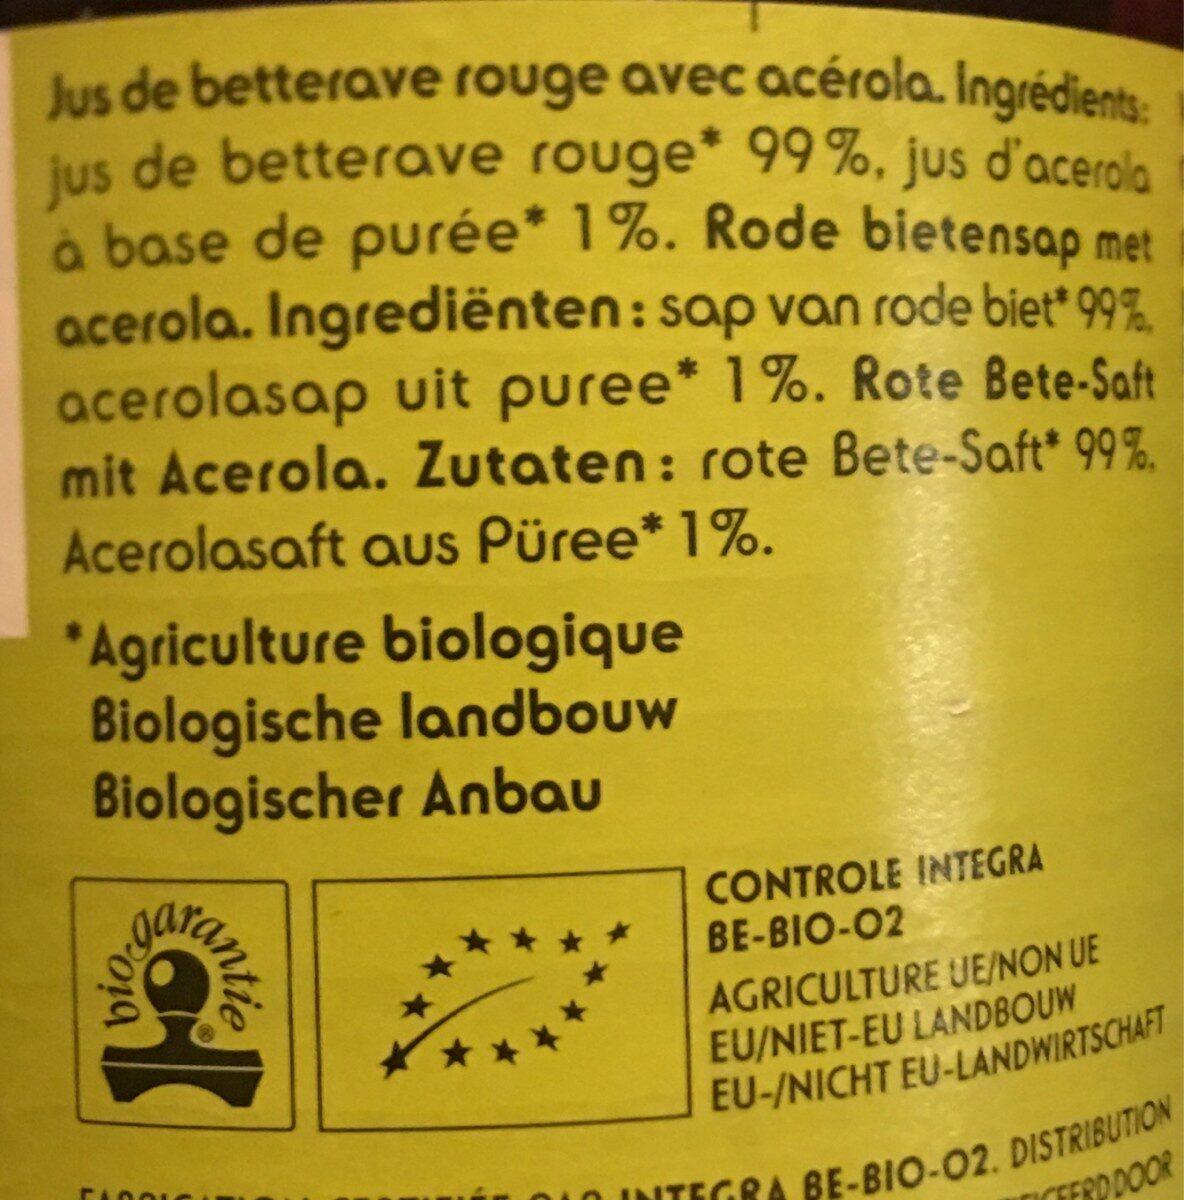 Jus de betterave rouge - Ingrediënten - en